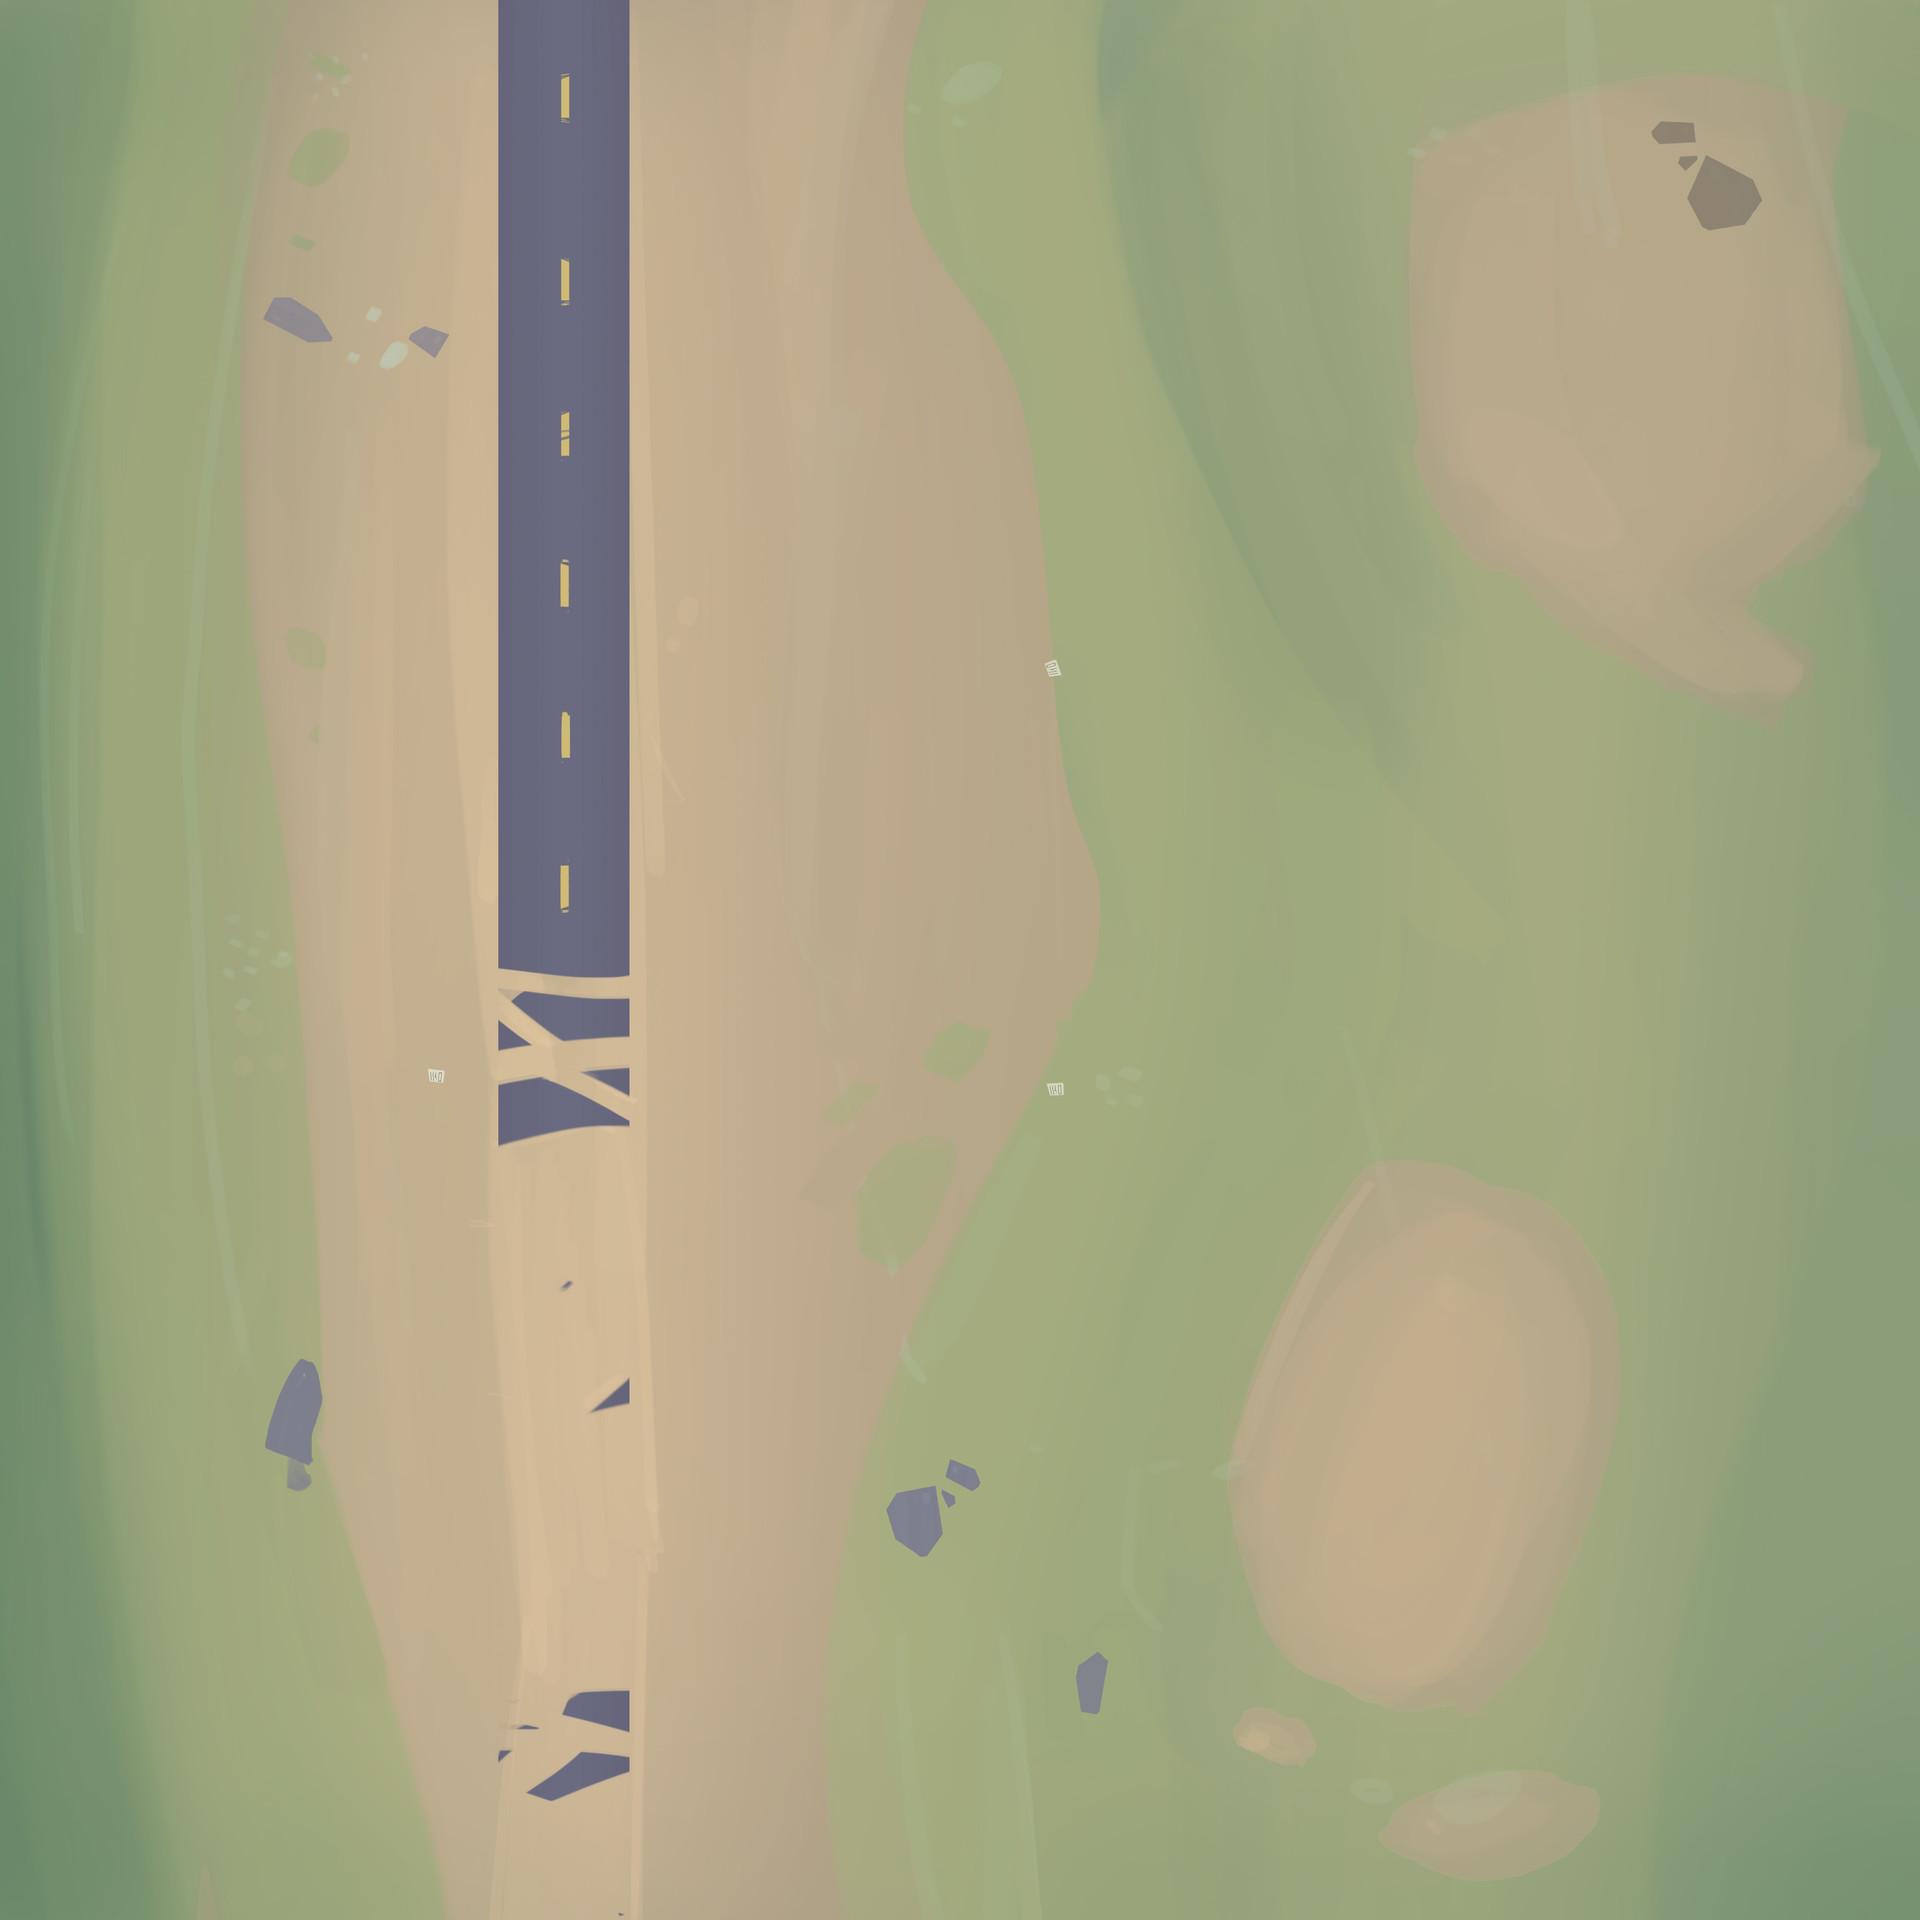 Drakhas oguzalp donduren paintedfloor02